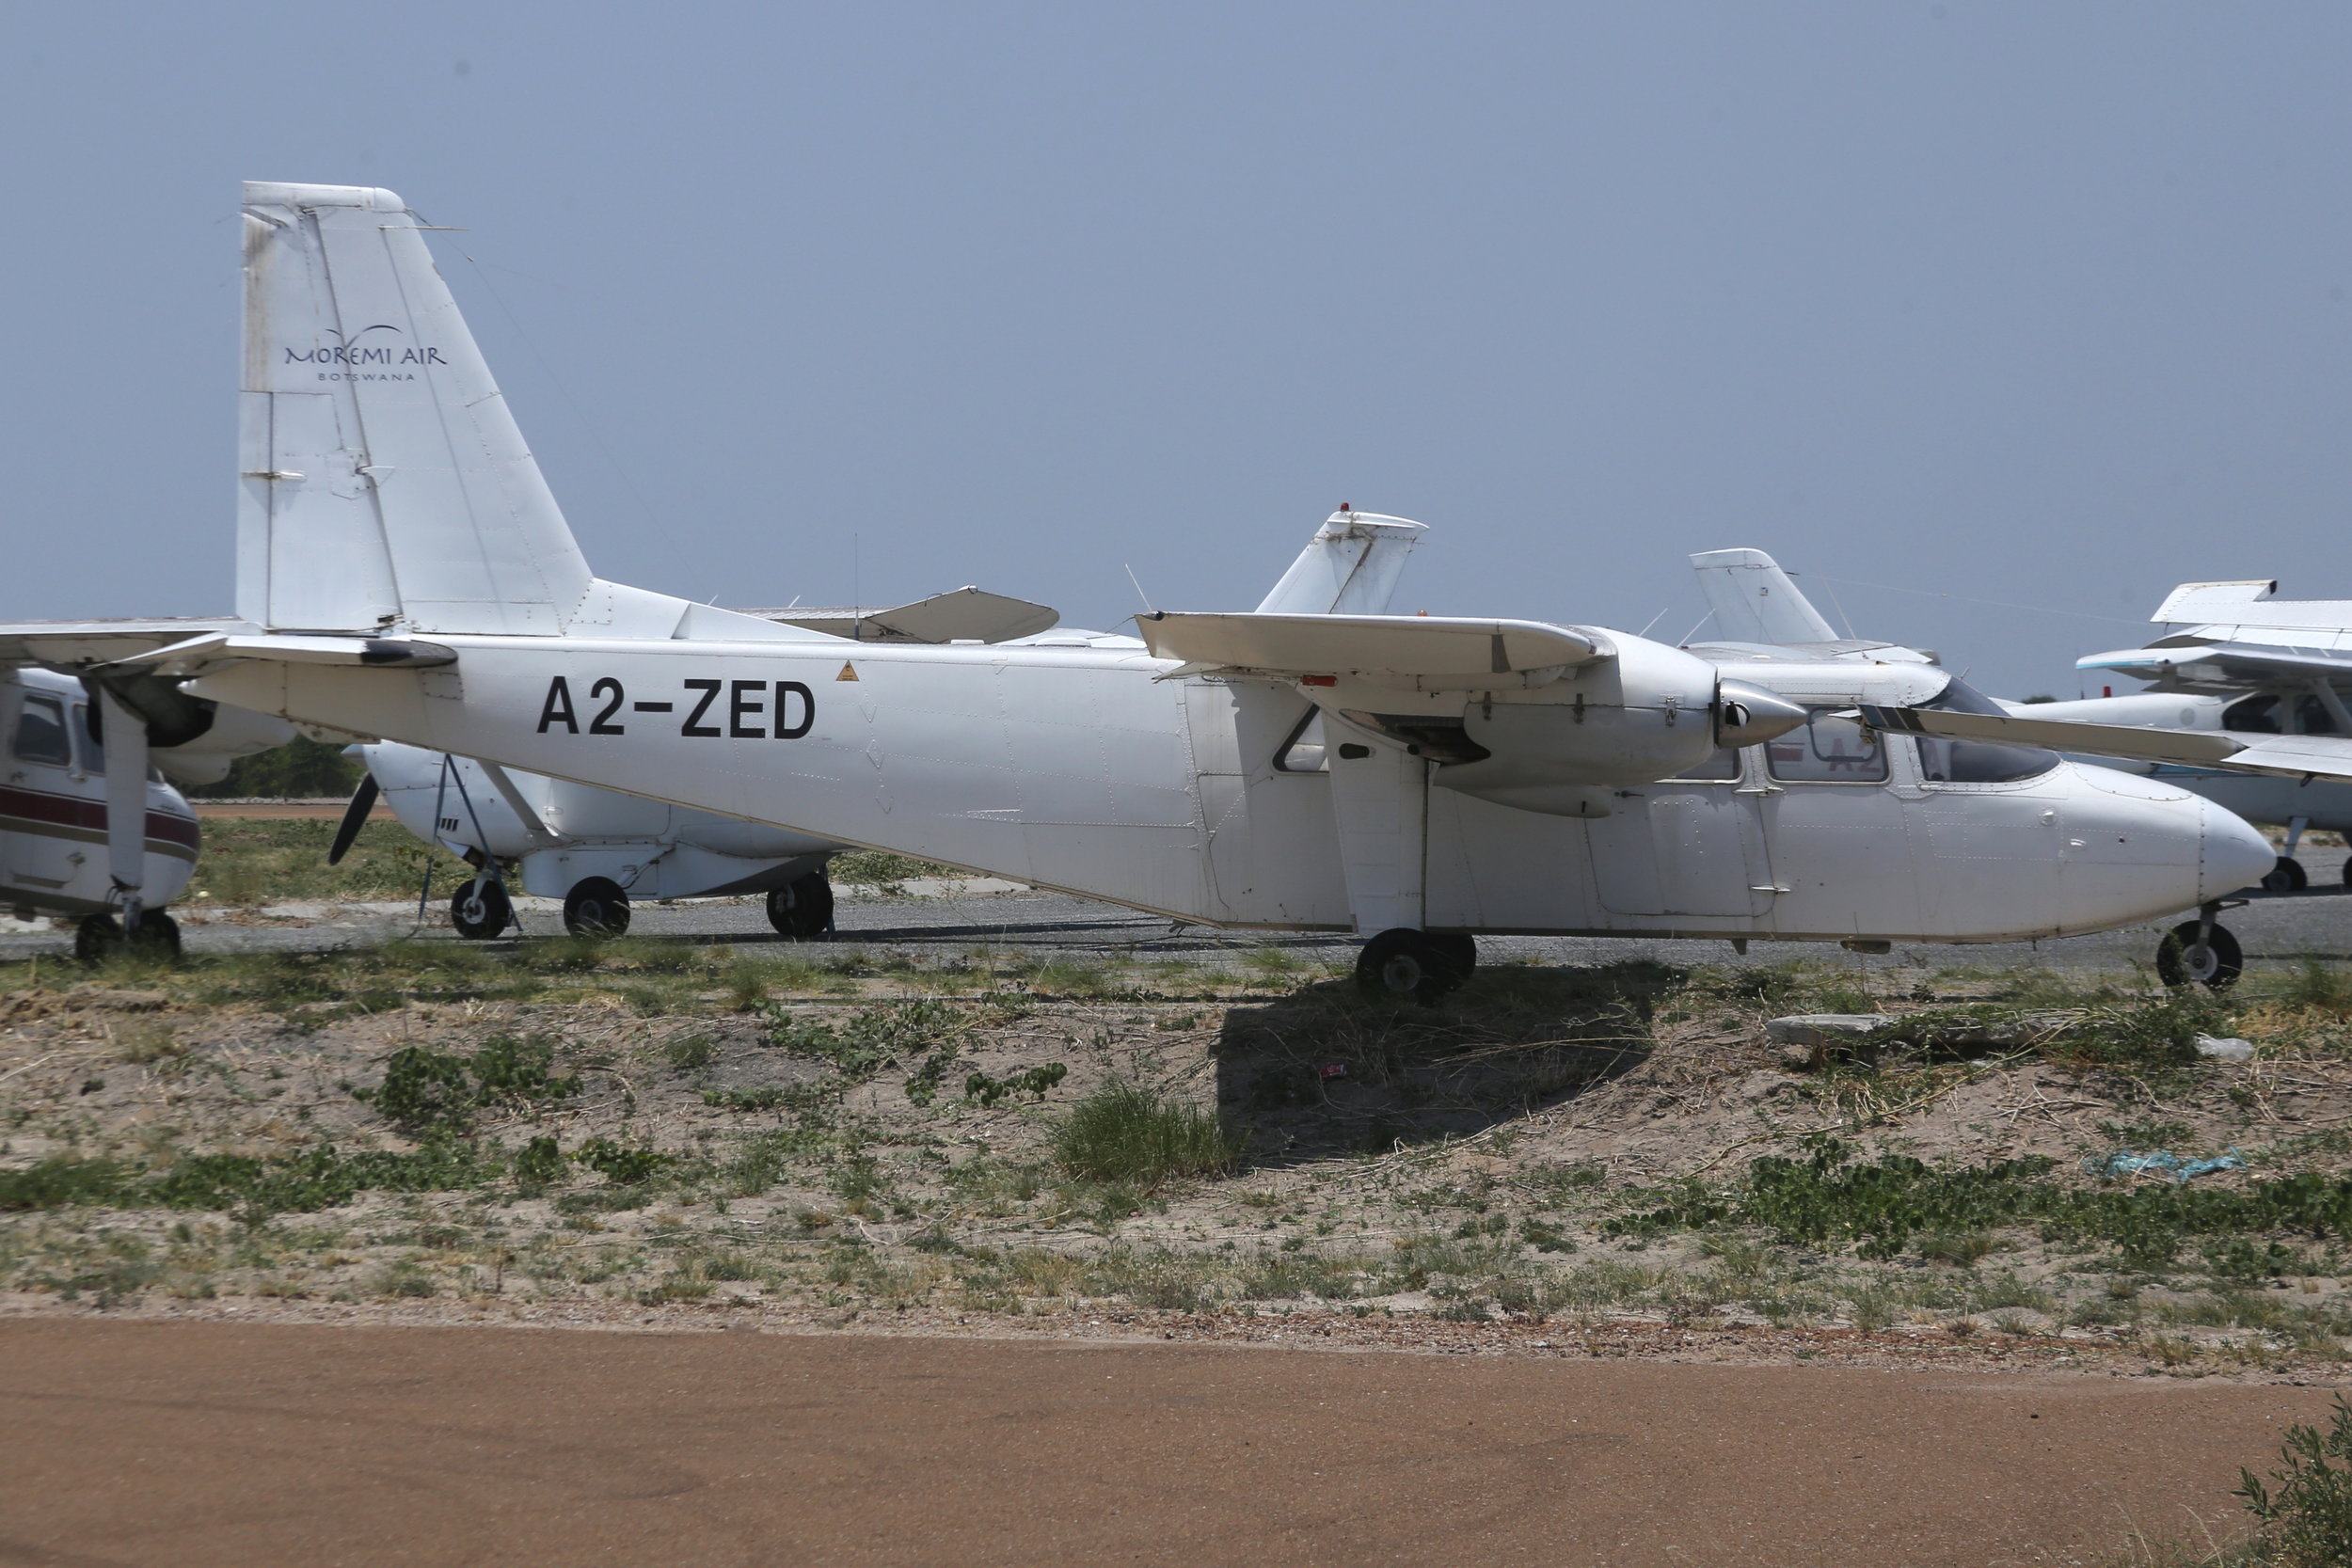 A2-ZED Moremi Air Britten Norman Islander taken at Maun, Botswan 15th November 2018 by John Wood